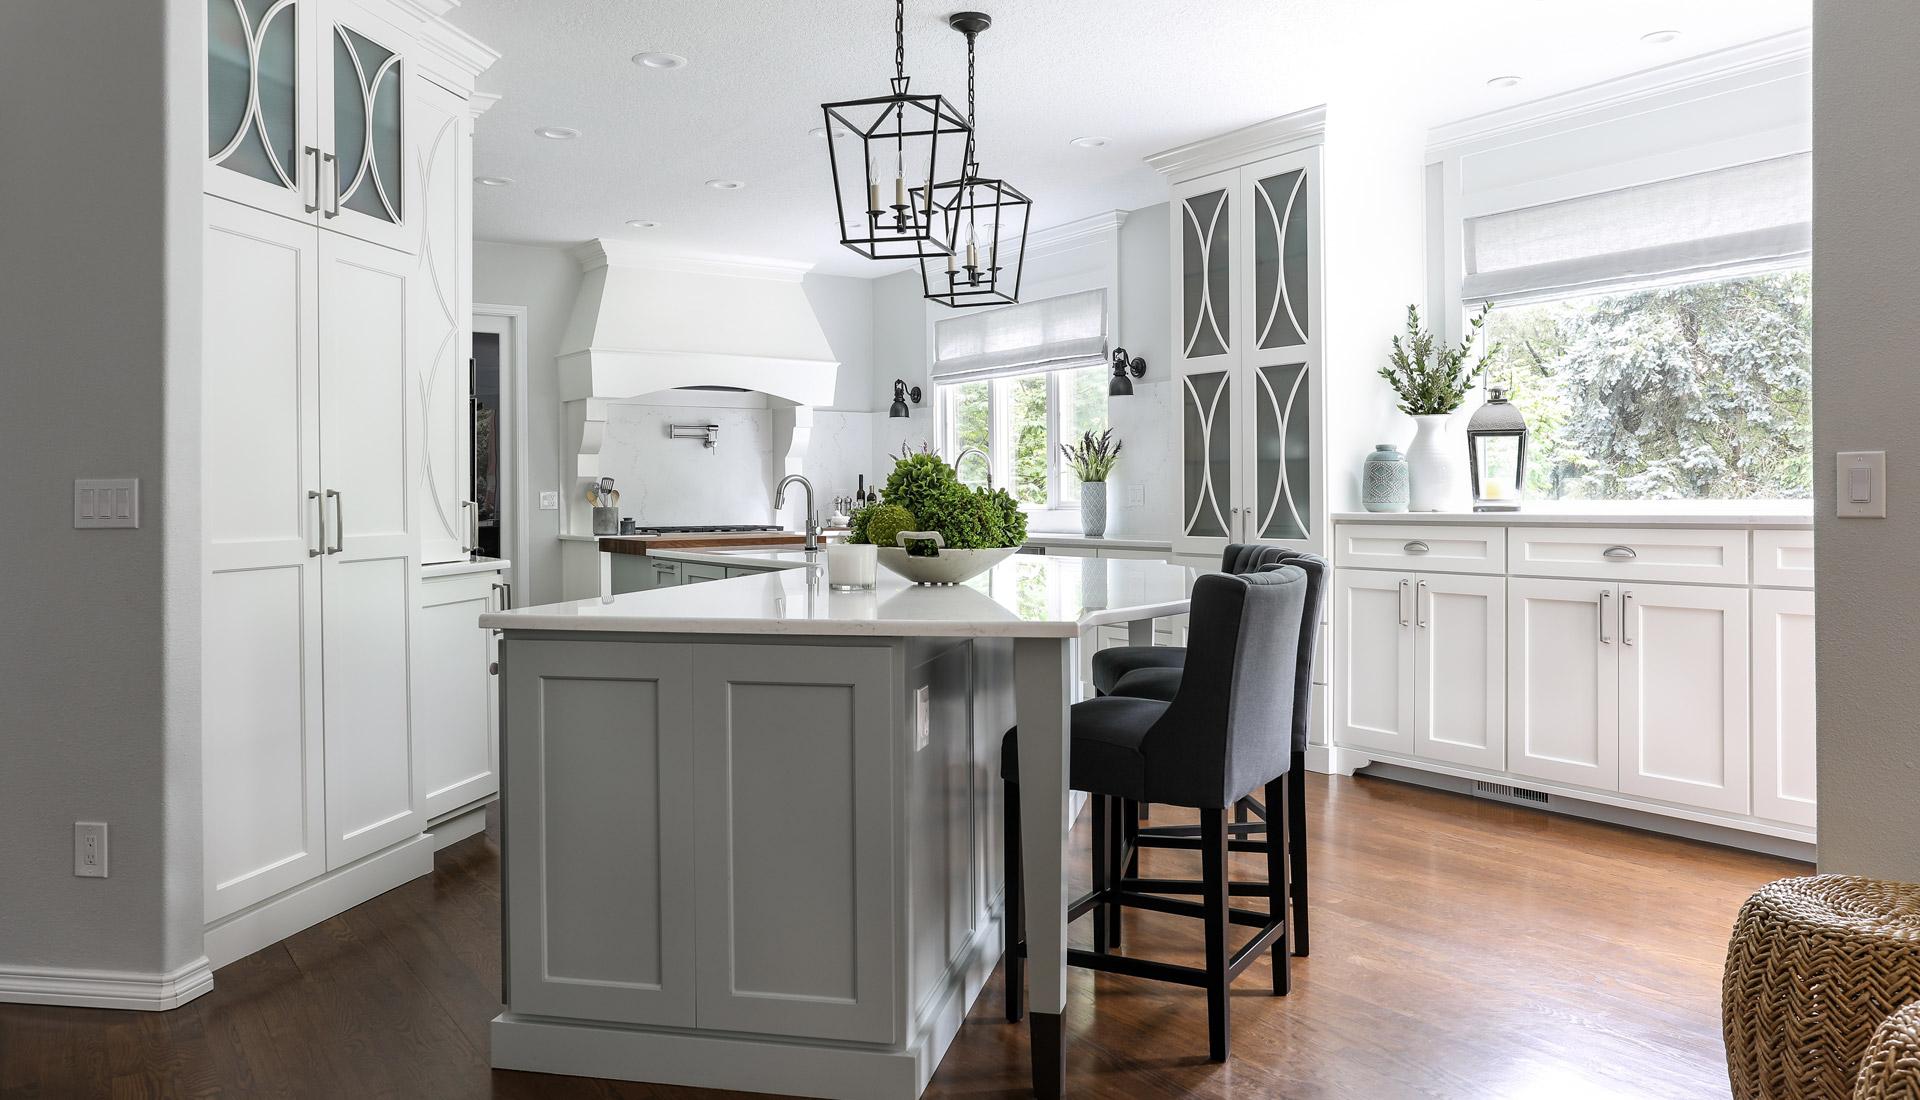 Oswego Kitchen Full View